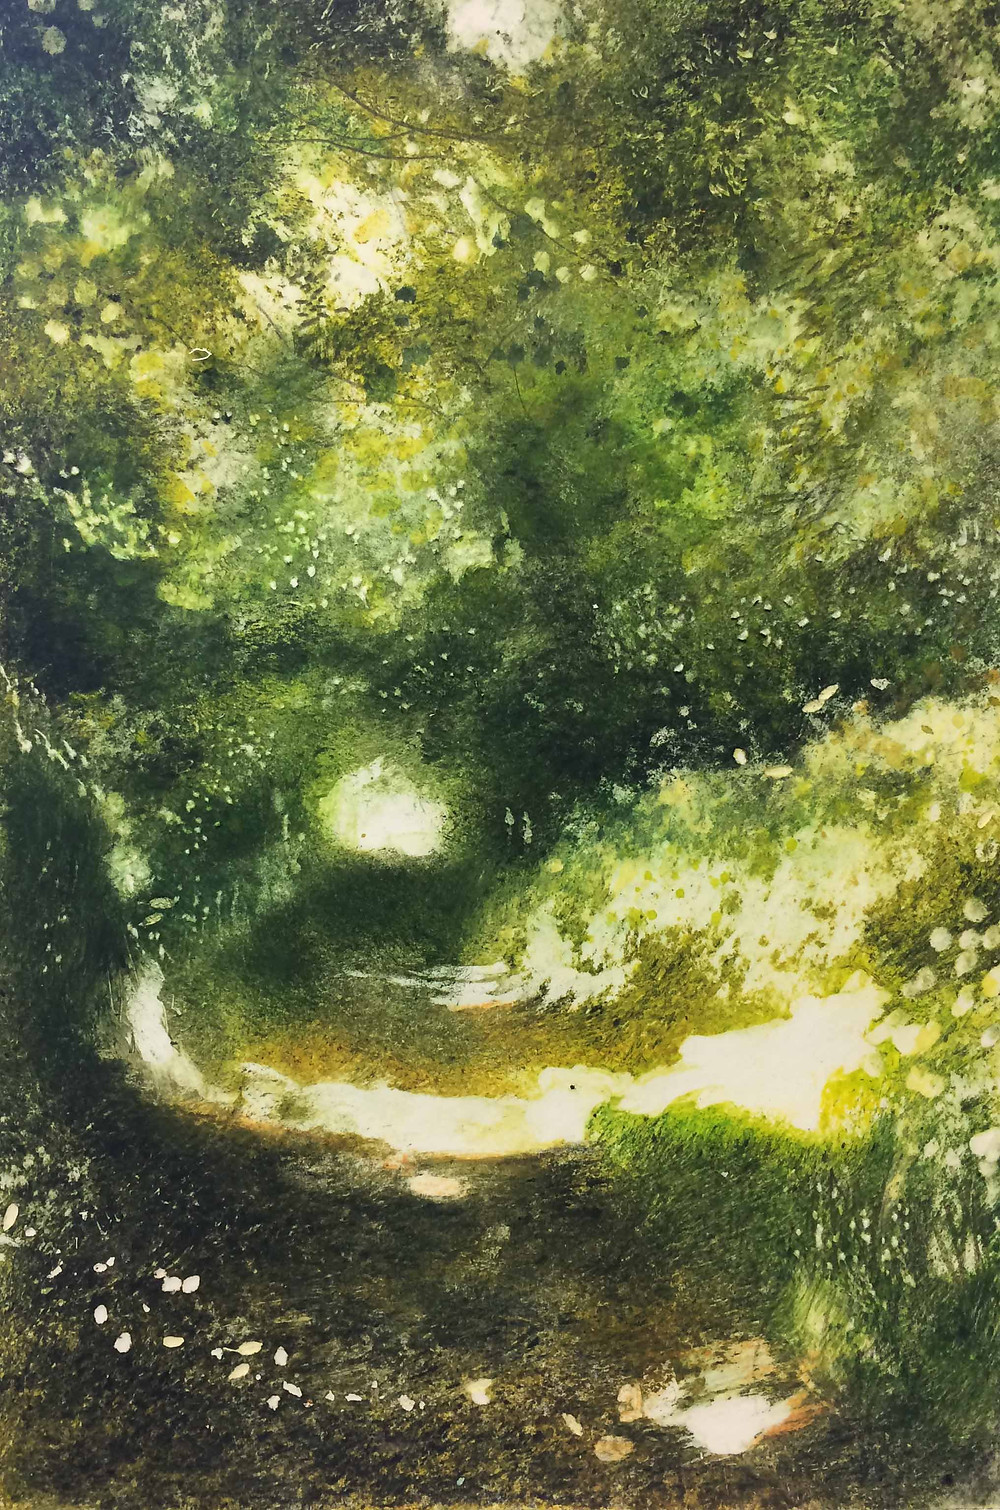 Ox Drove in June - Rachel Sargent Shaftesbury Dorset artist folde foldedorset